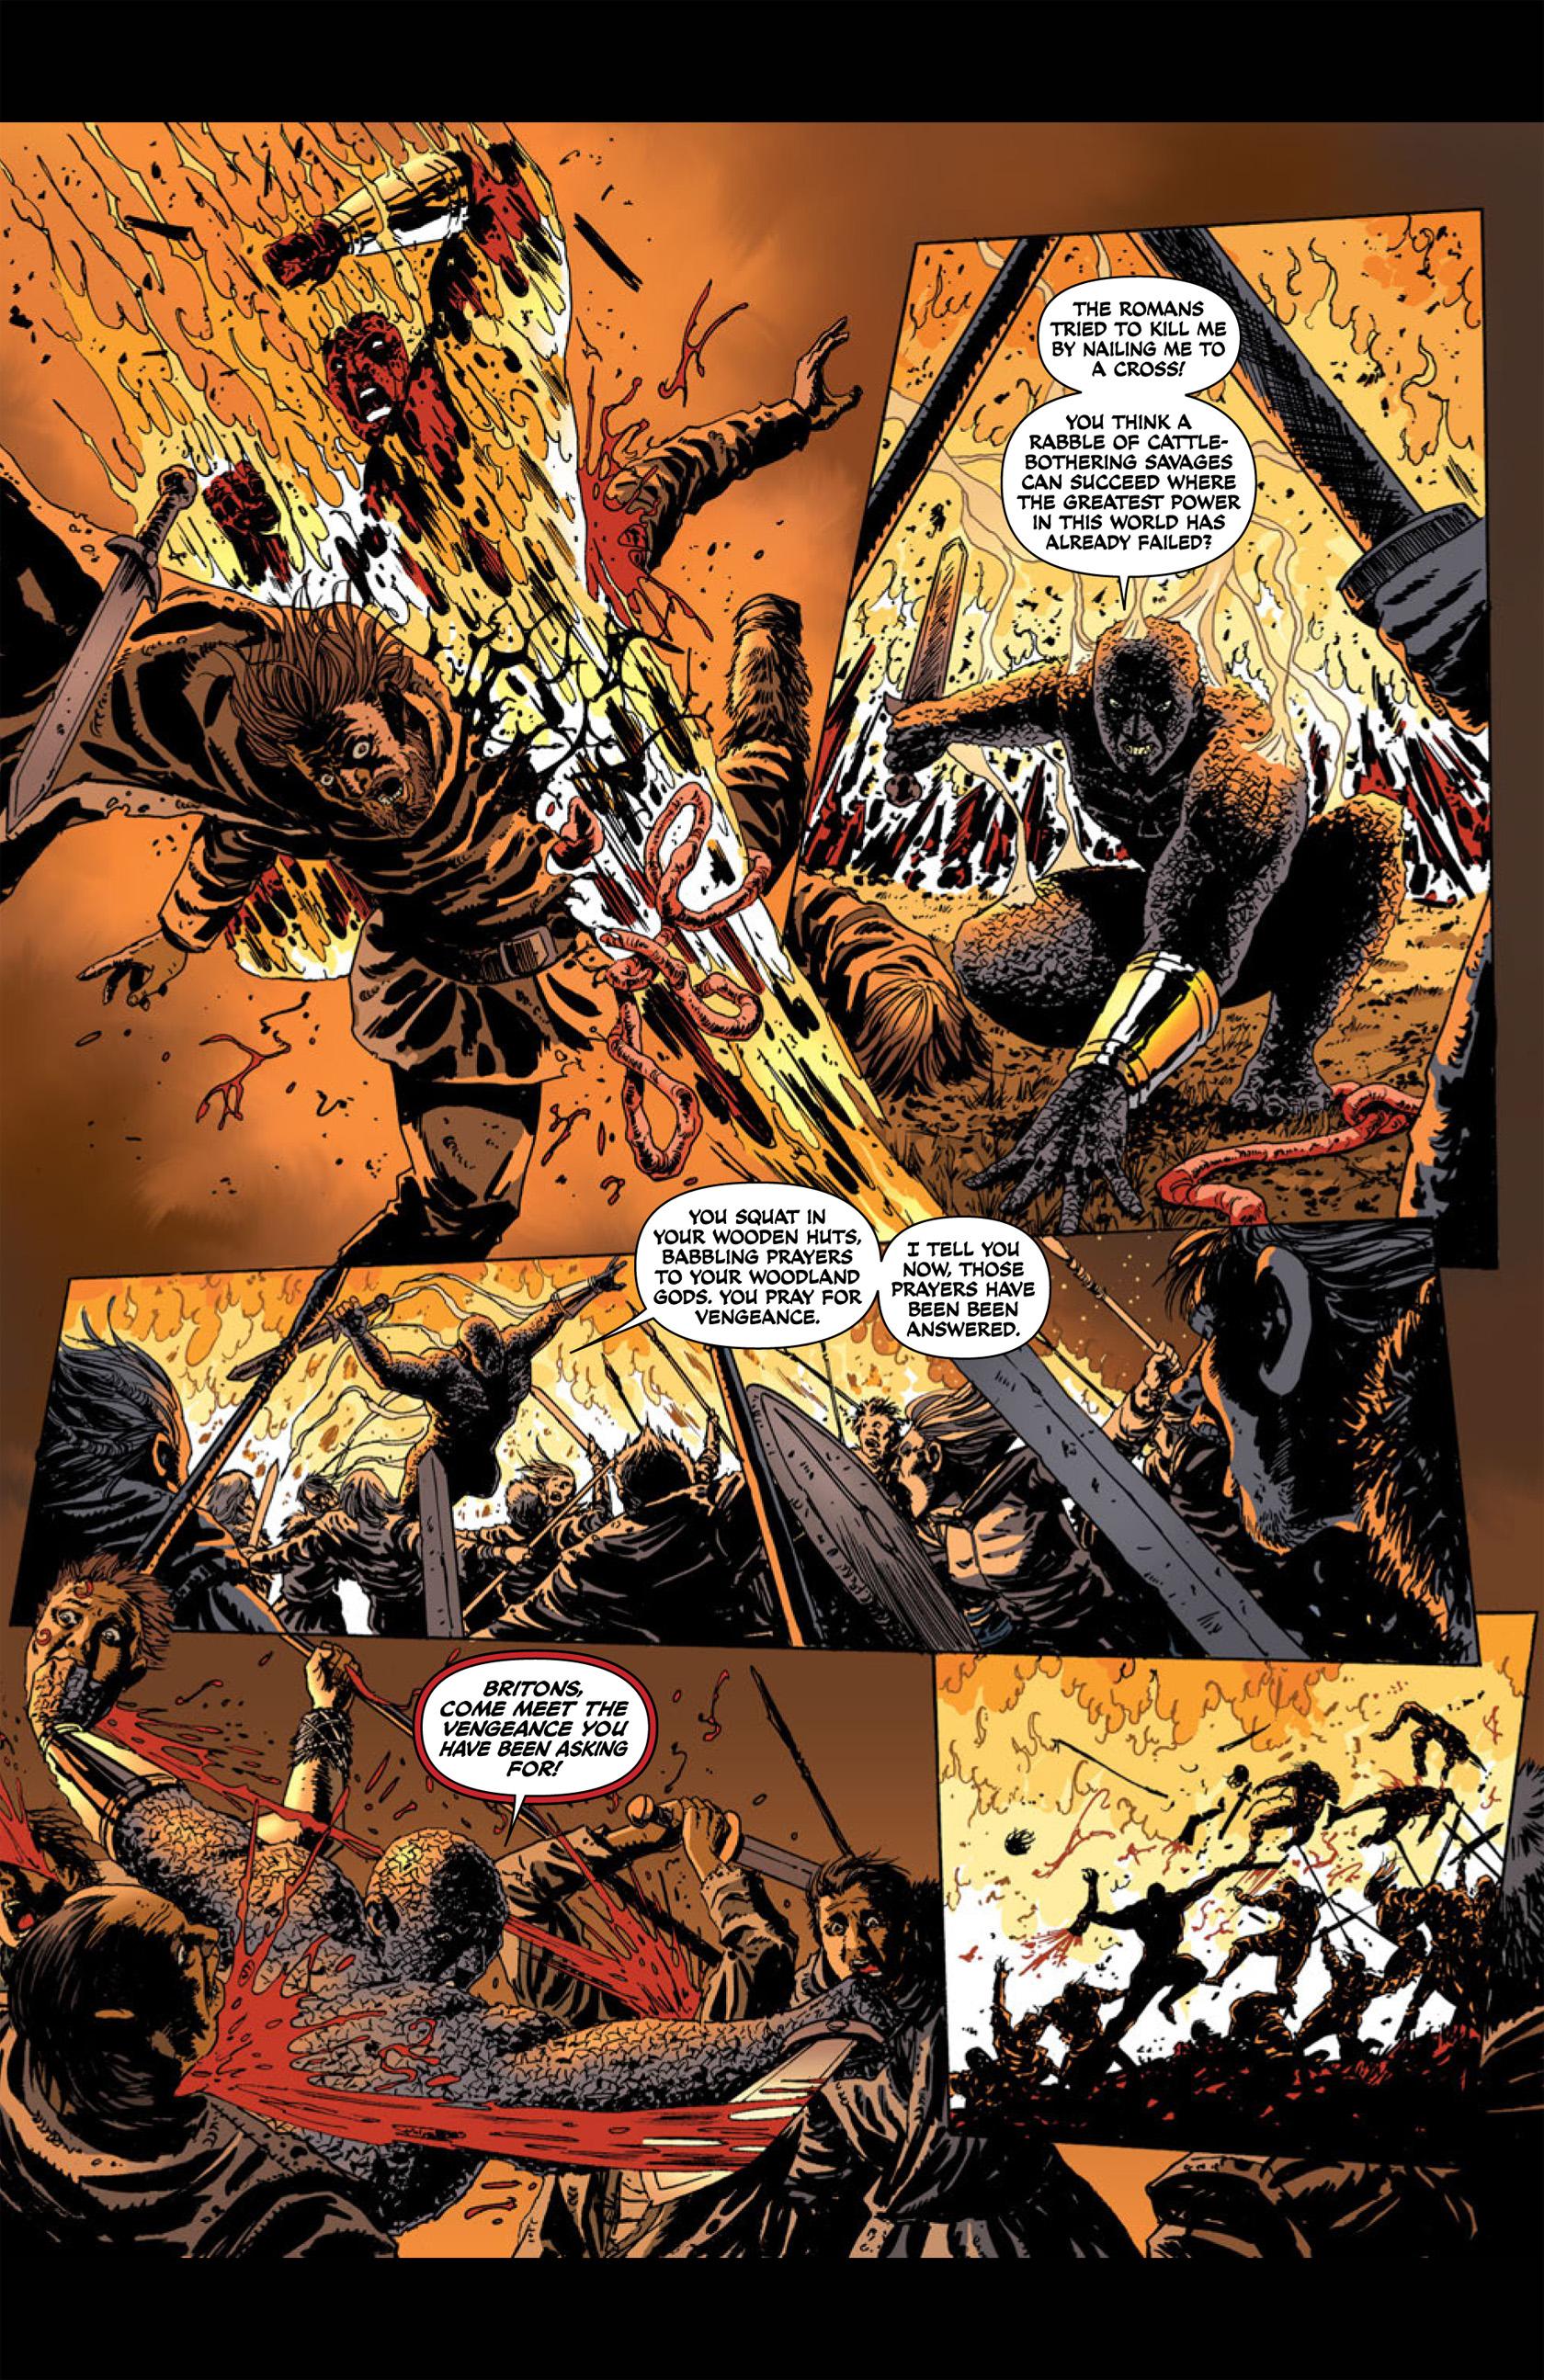 Read online Aquila comic -  Issue #1 - 16